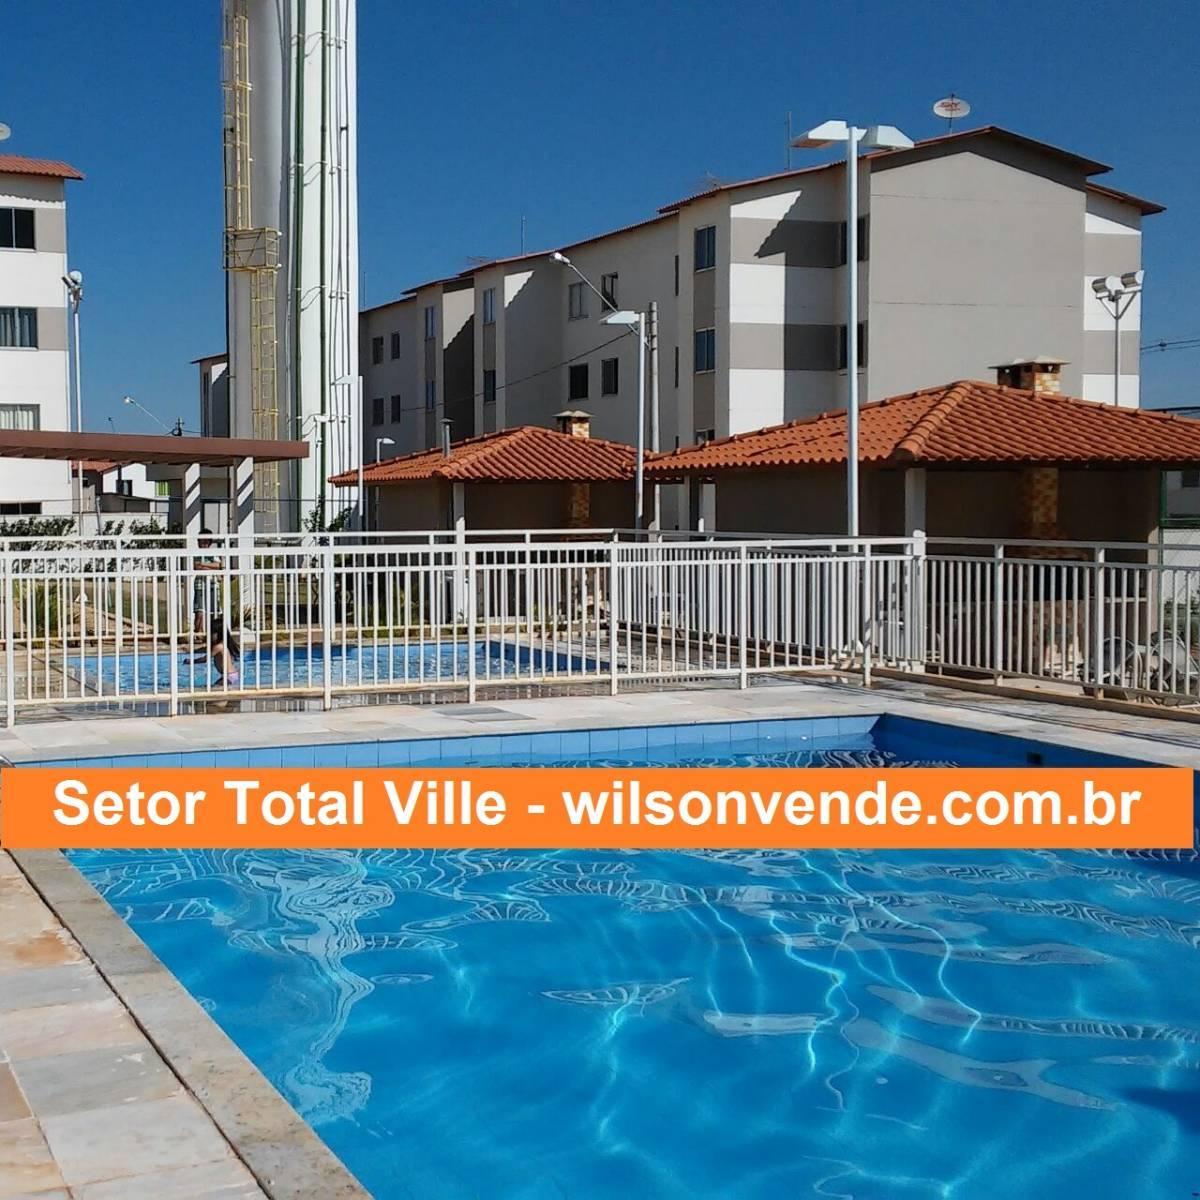 ÁGIO TOTAL VILLE QD. 103 | SOBRADO 3 QTS (97,99M²) | ARMÁRIOS